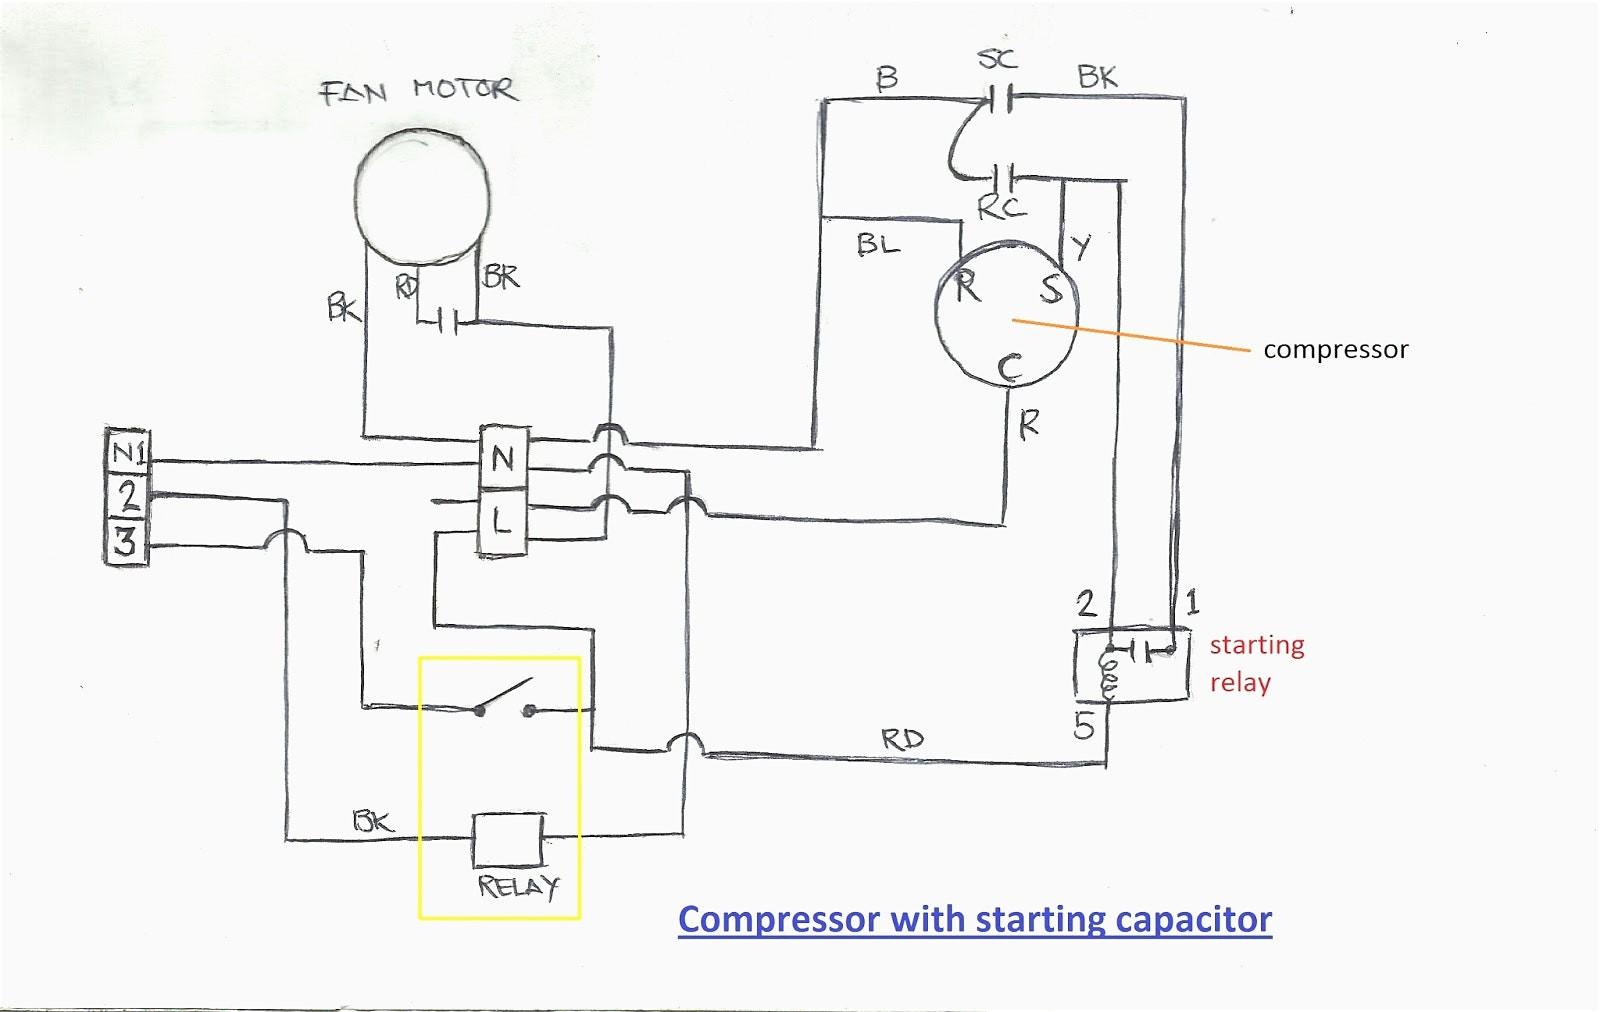 copeland condensing unit wiring diagram ac pressor capacitor rh jasonandor org hvac pressor parts diagram hvac